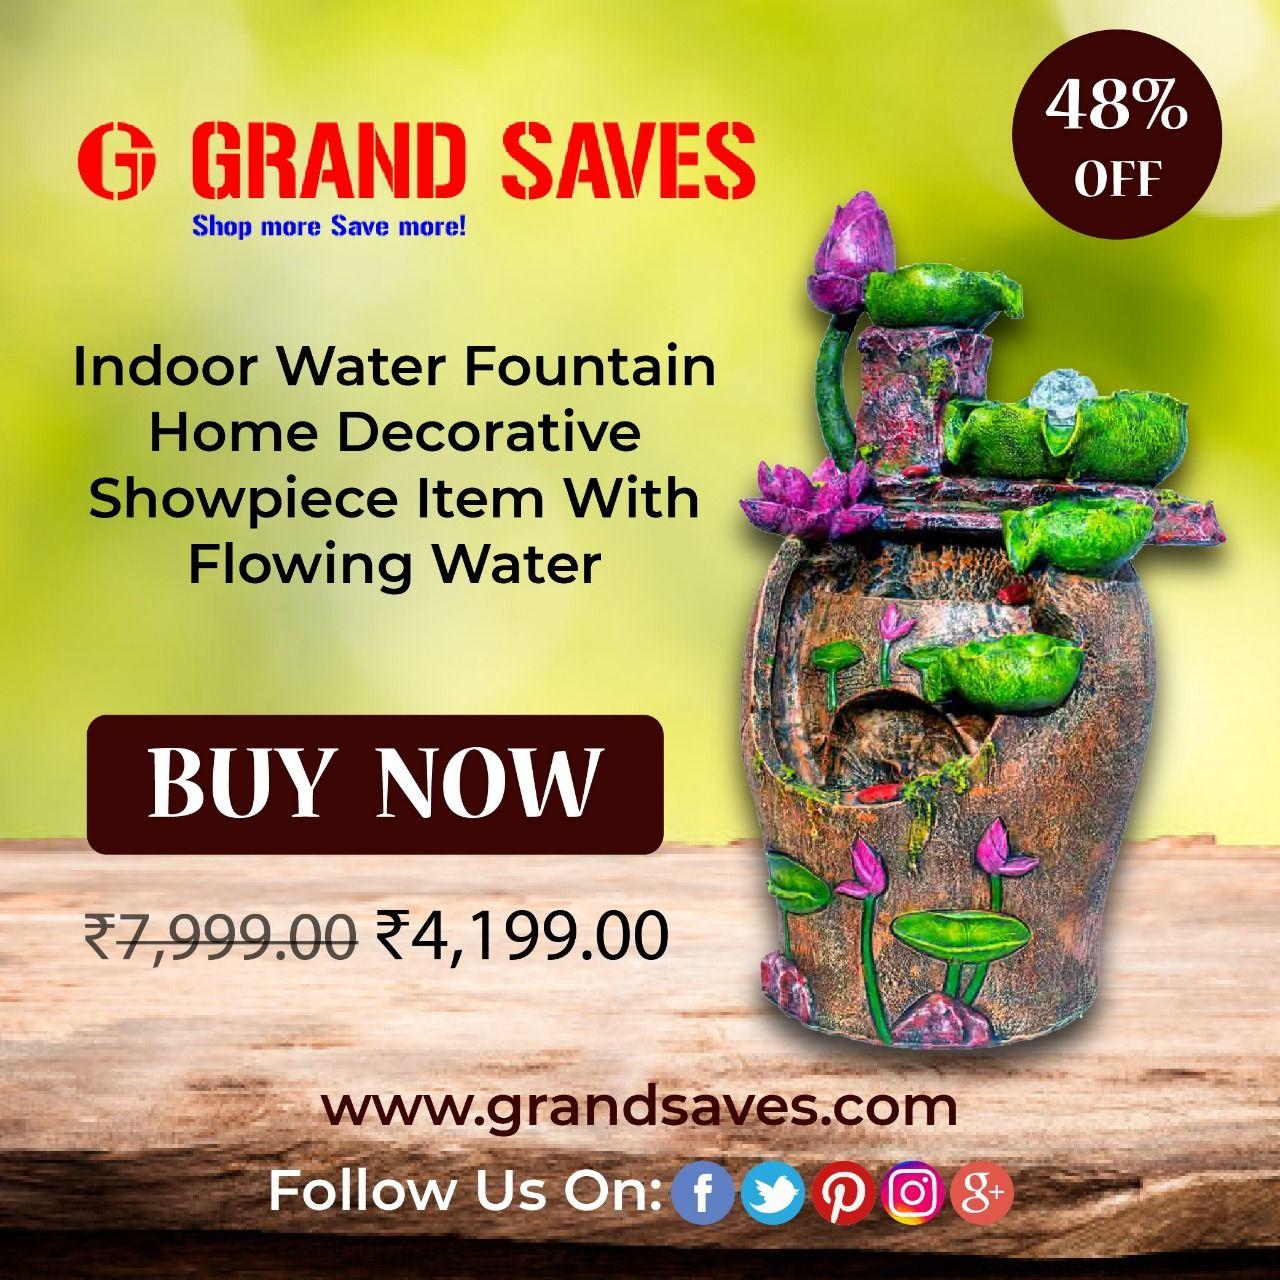 Indoor Water Fountain Home Decorative Showpiece Grandsaves